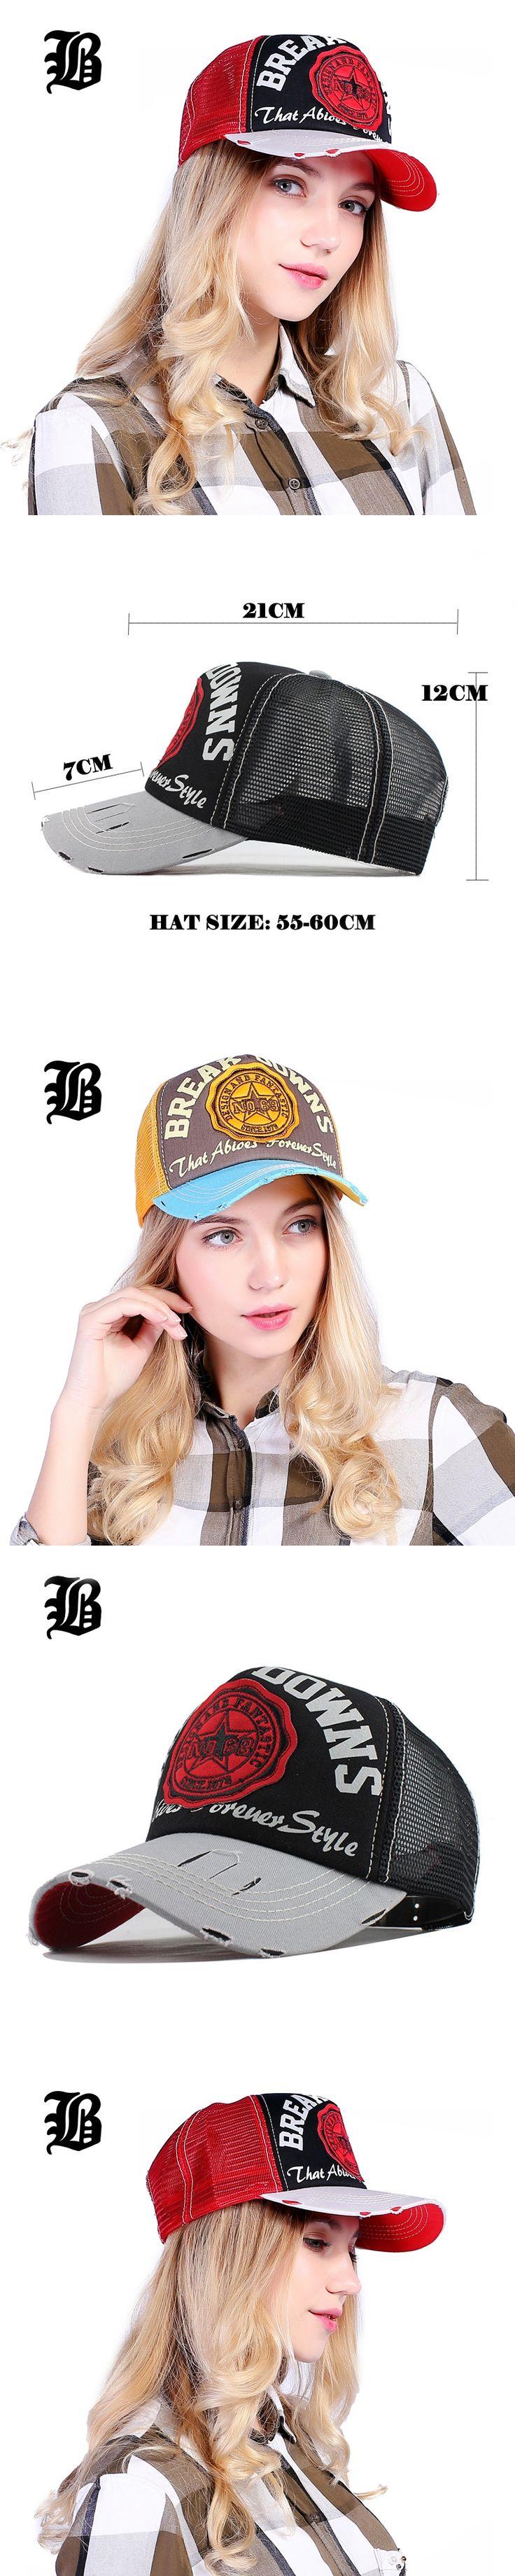 [FLB] Wholesale Baseball Cap summer snapback hats casquette embroidery letter cap bone girl hats for women men Trucker cap